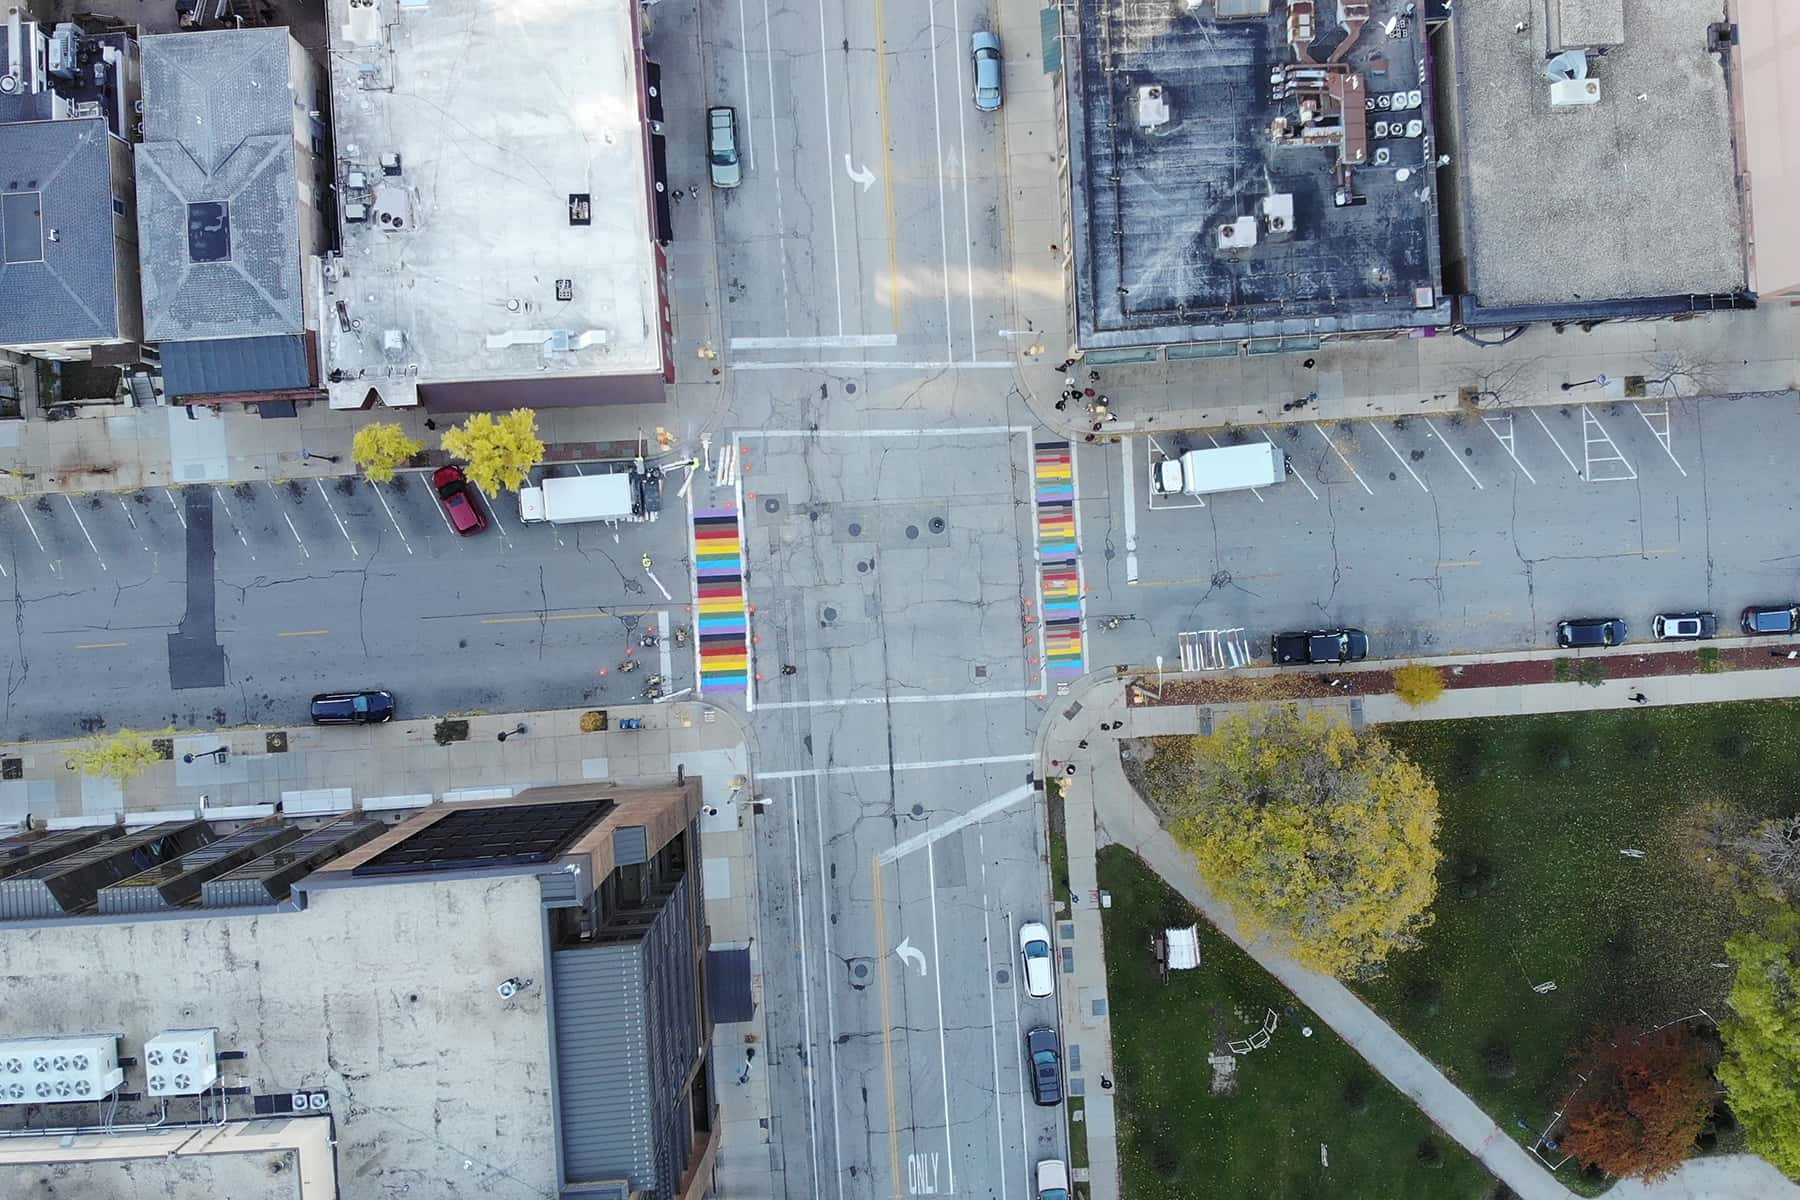 03_110318_rainbowcrosswalk_dronephoto_032